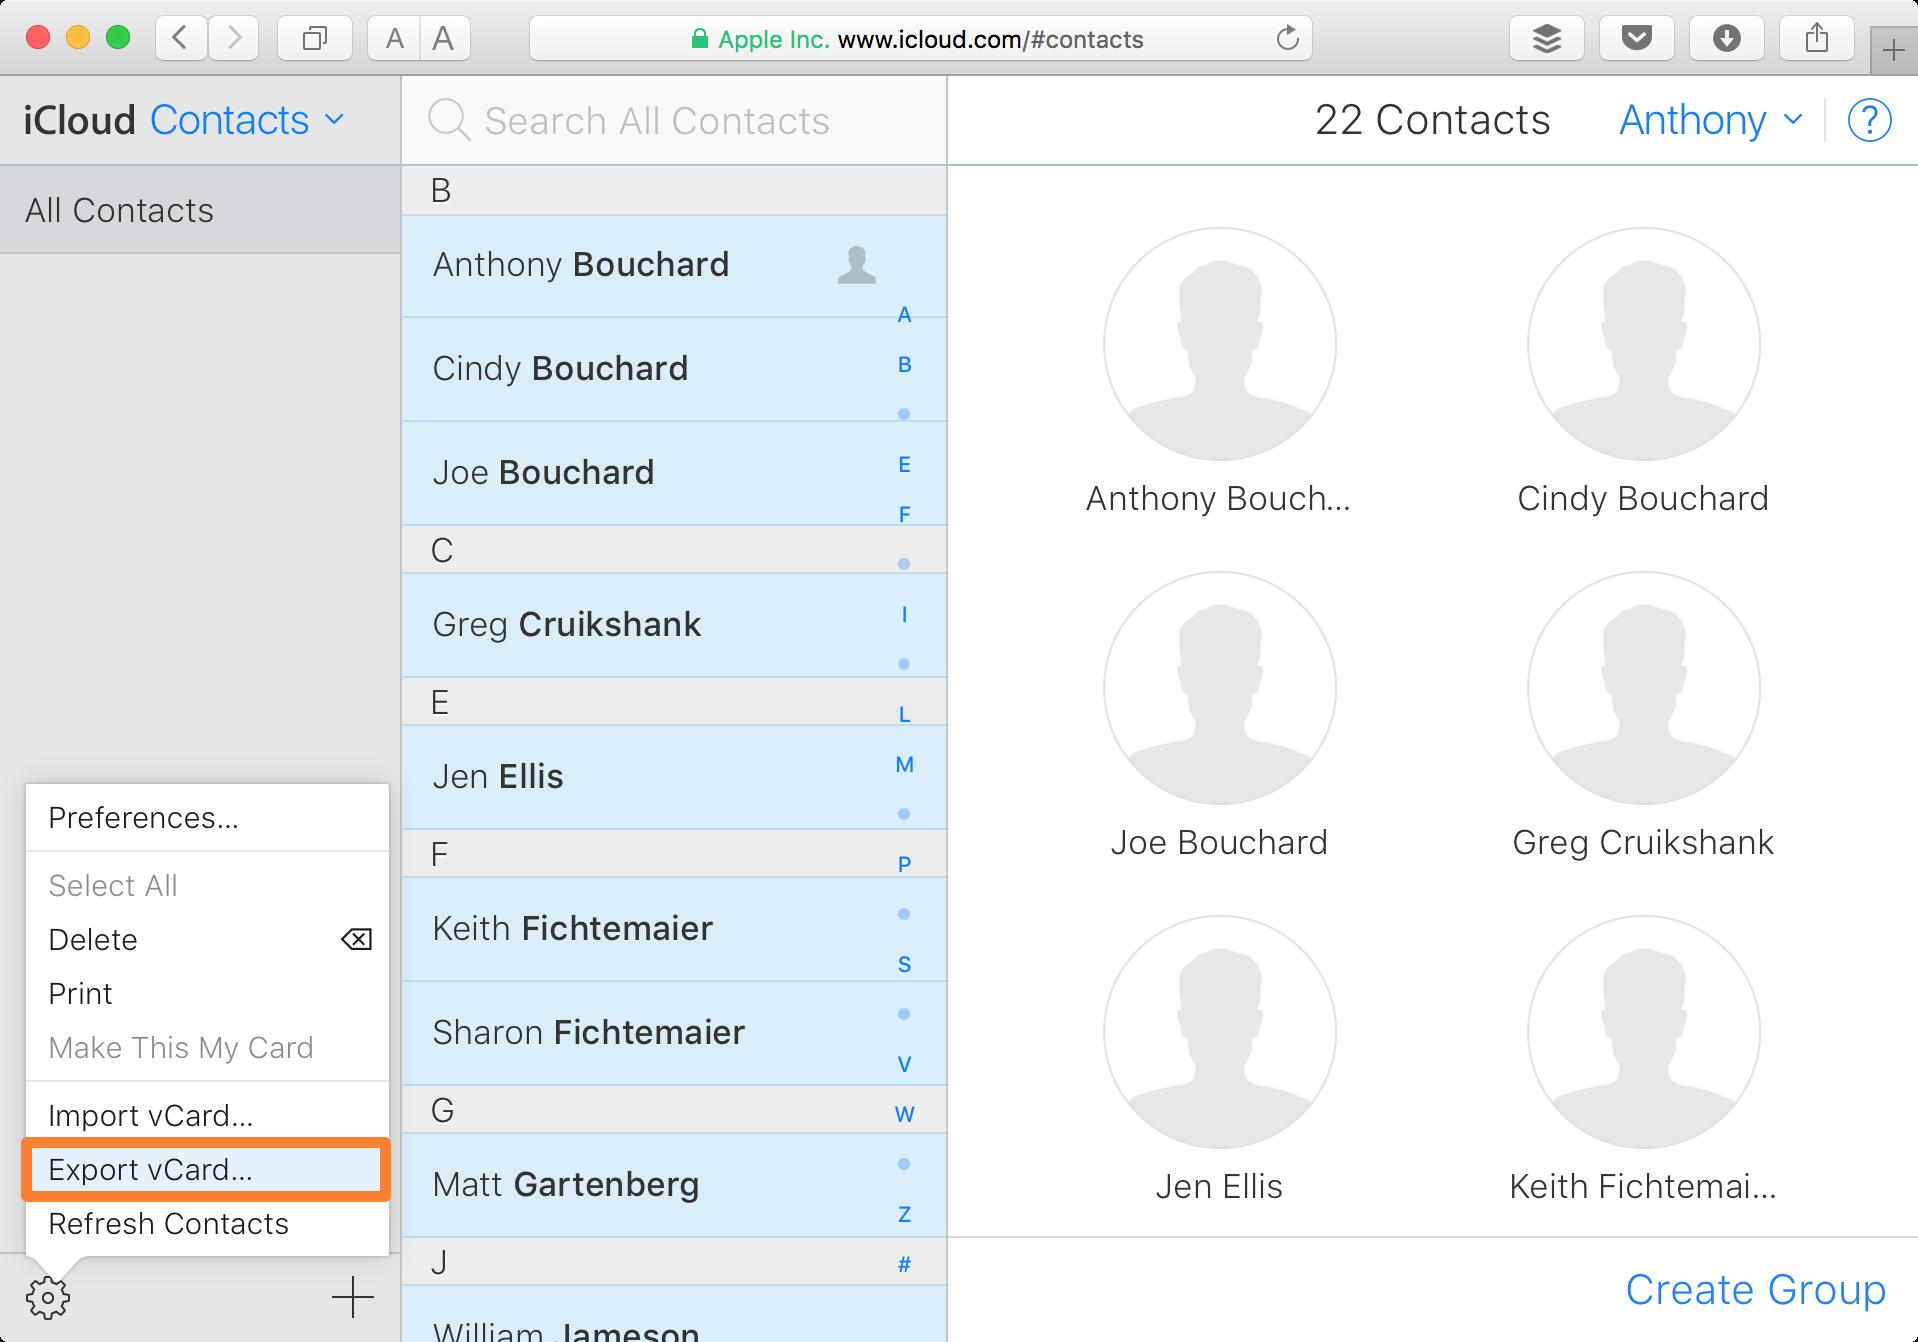 iCloud Website Contacts Export vCard